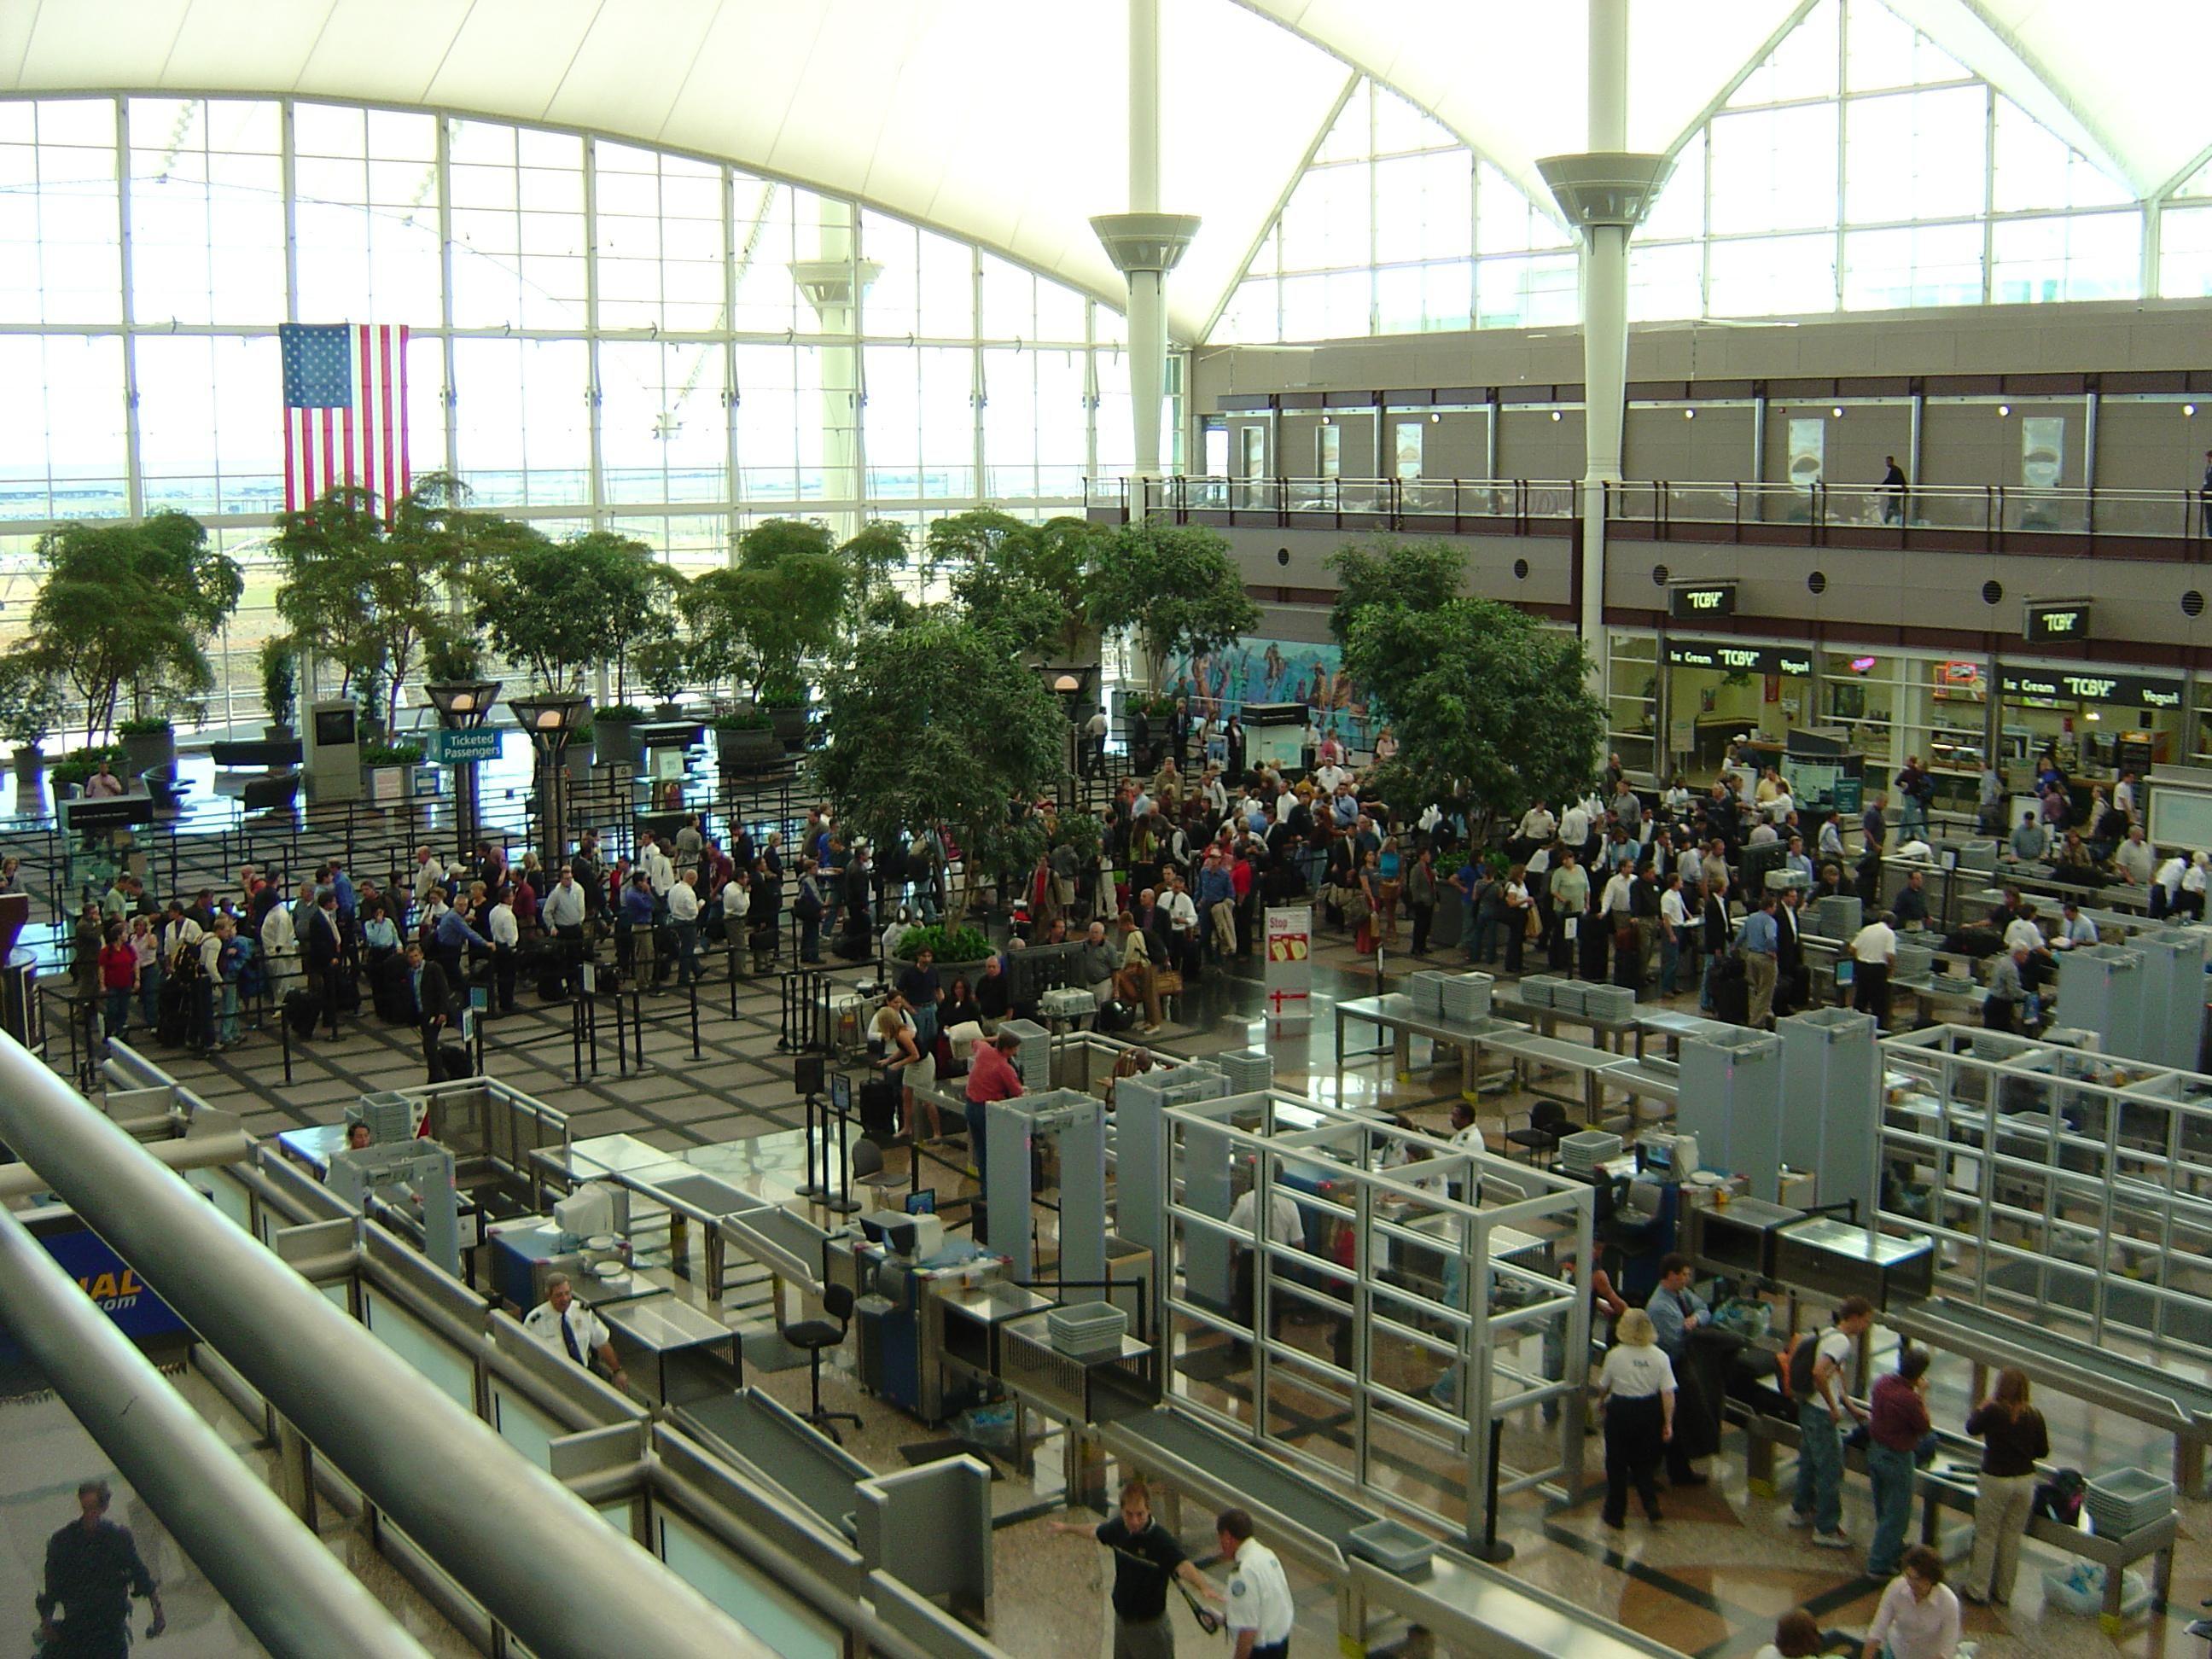 Airport_security_lines.jpg (2592×1944)